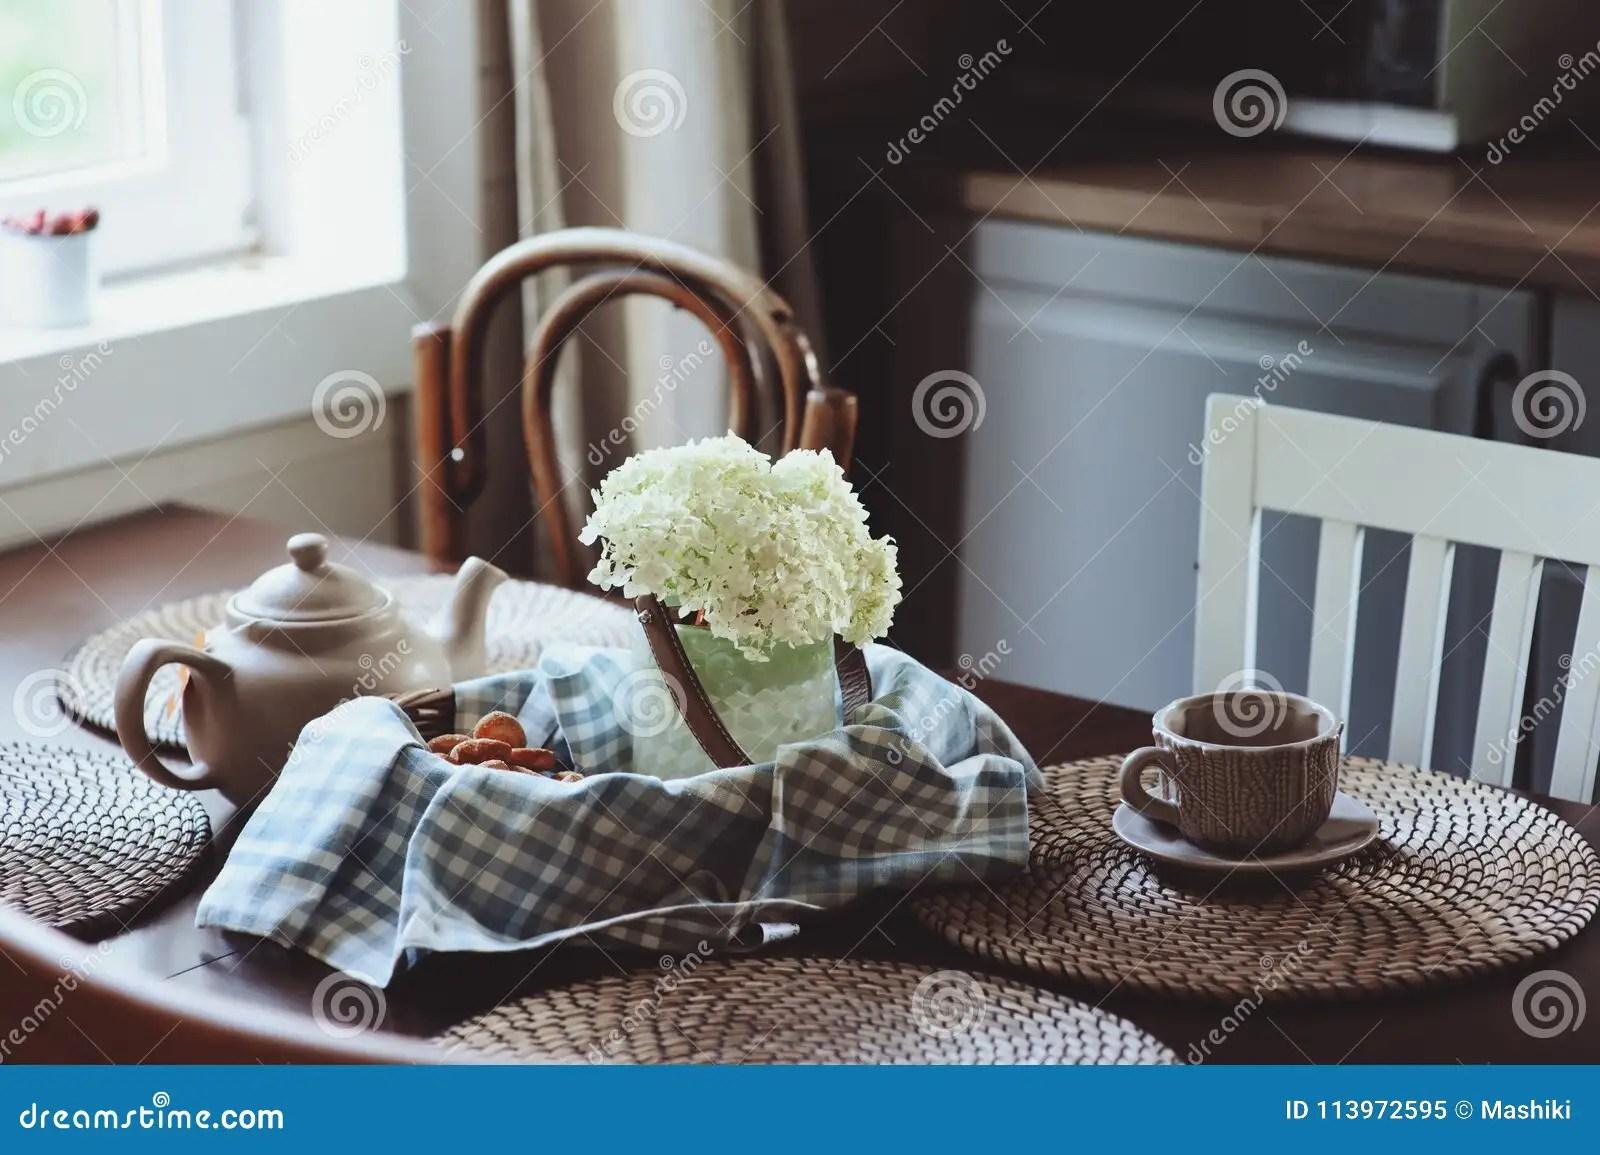 summer kitchens chalkboard for kitchen wall 在土气乡间别墅厨房的舒适夏天早晨库存图片 图片包括有照亮 花束 咖啡 在土气乡间别墅厨房的舒适夏天早晨